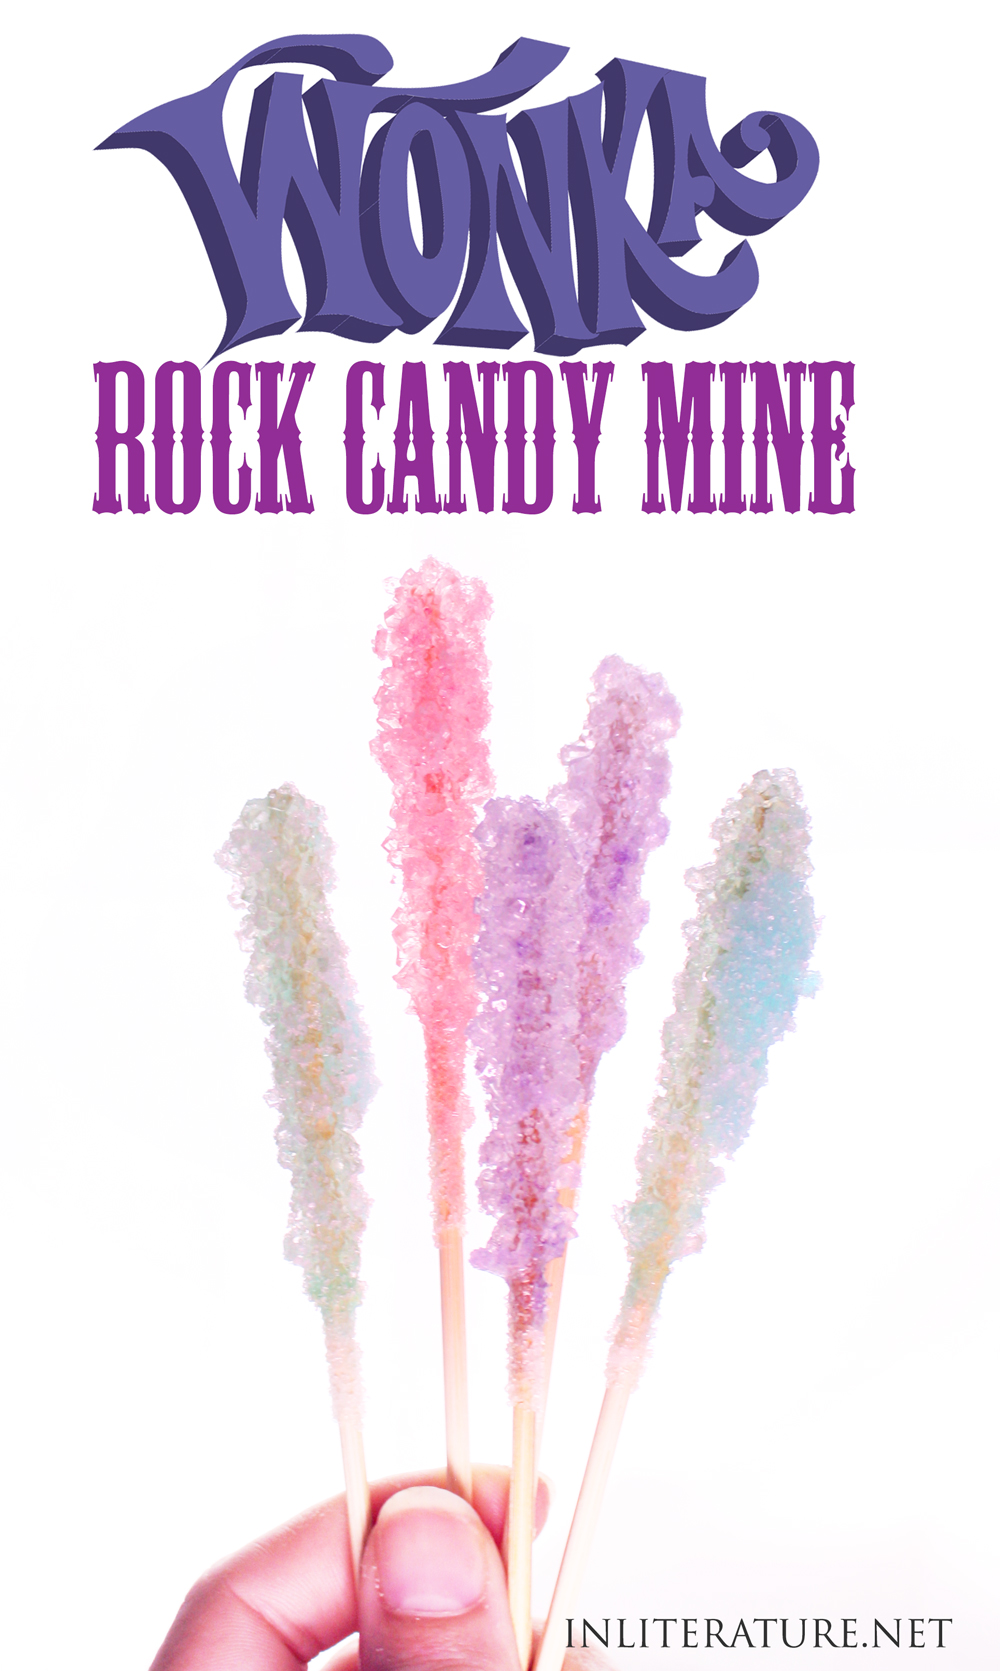 Willy Wonka Series Rock Candy Mine